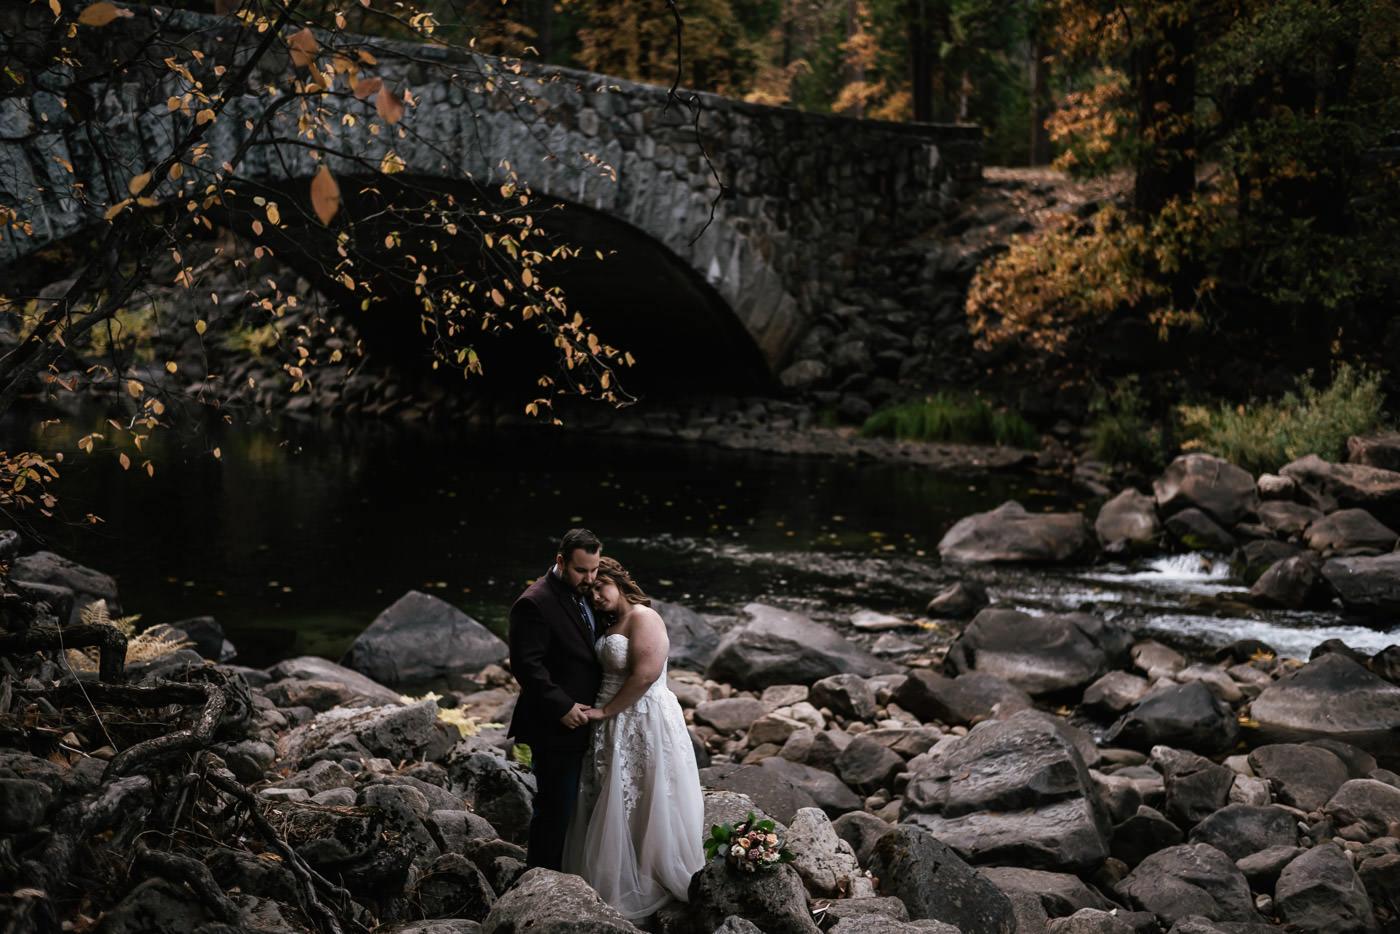 pohono-bridge-elopement-photos-yosemite-2.jpg